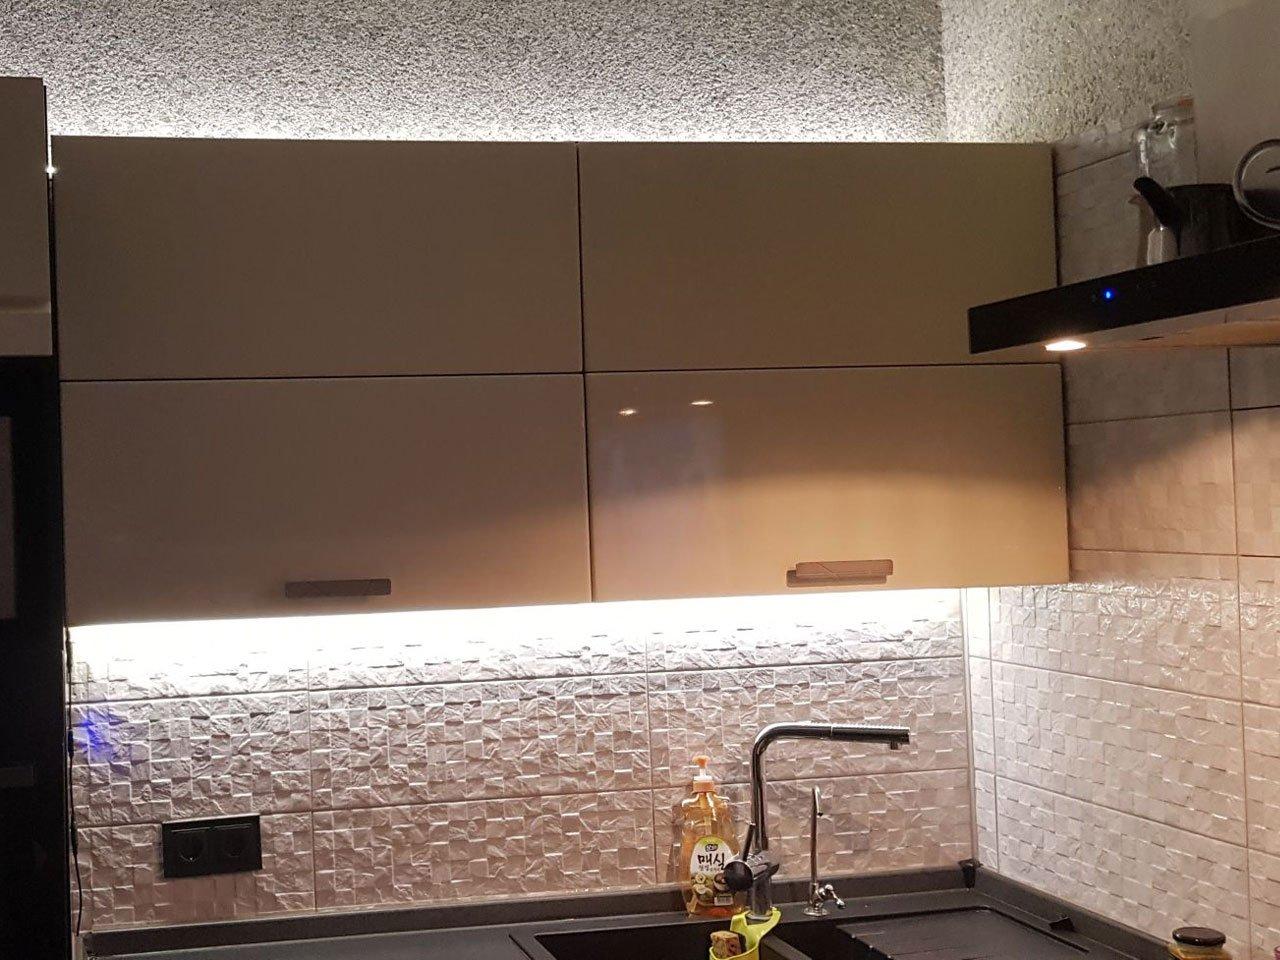 Подсветка прямой кухни на заказ отзыв iqlux Сергей 18_01_20 фото